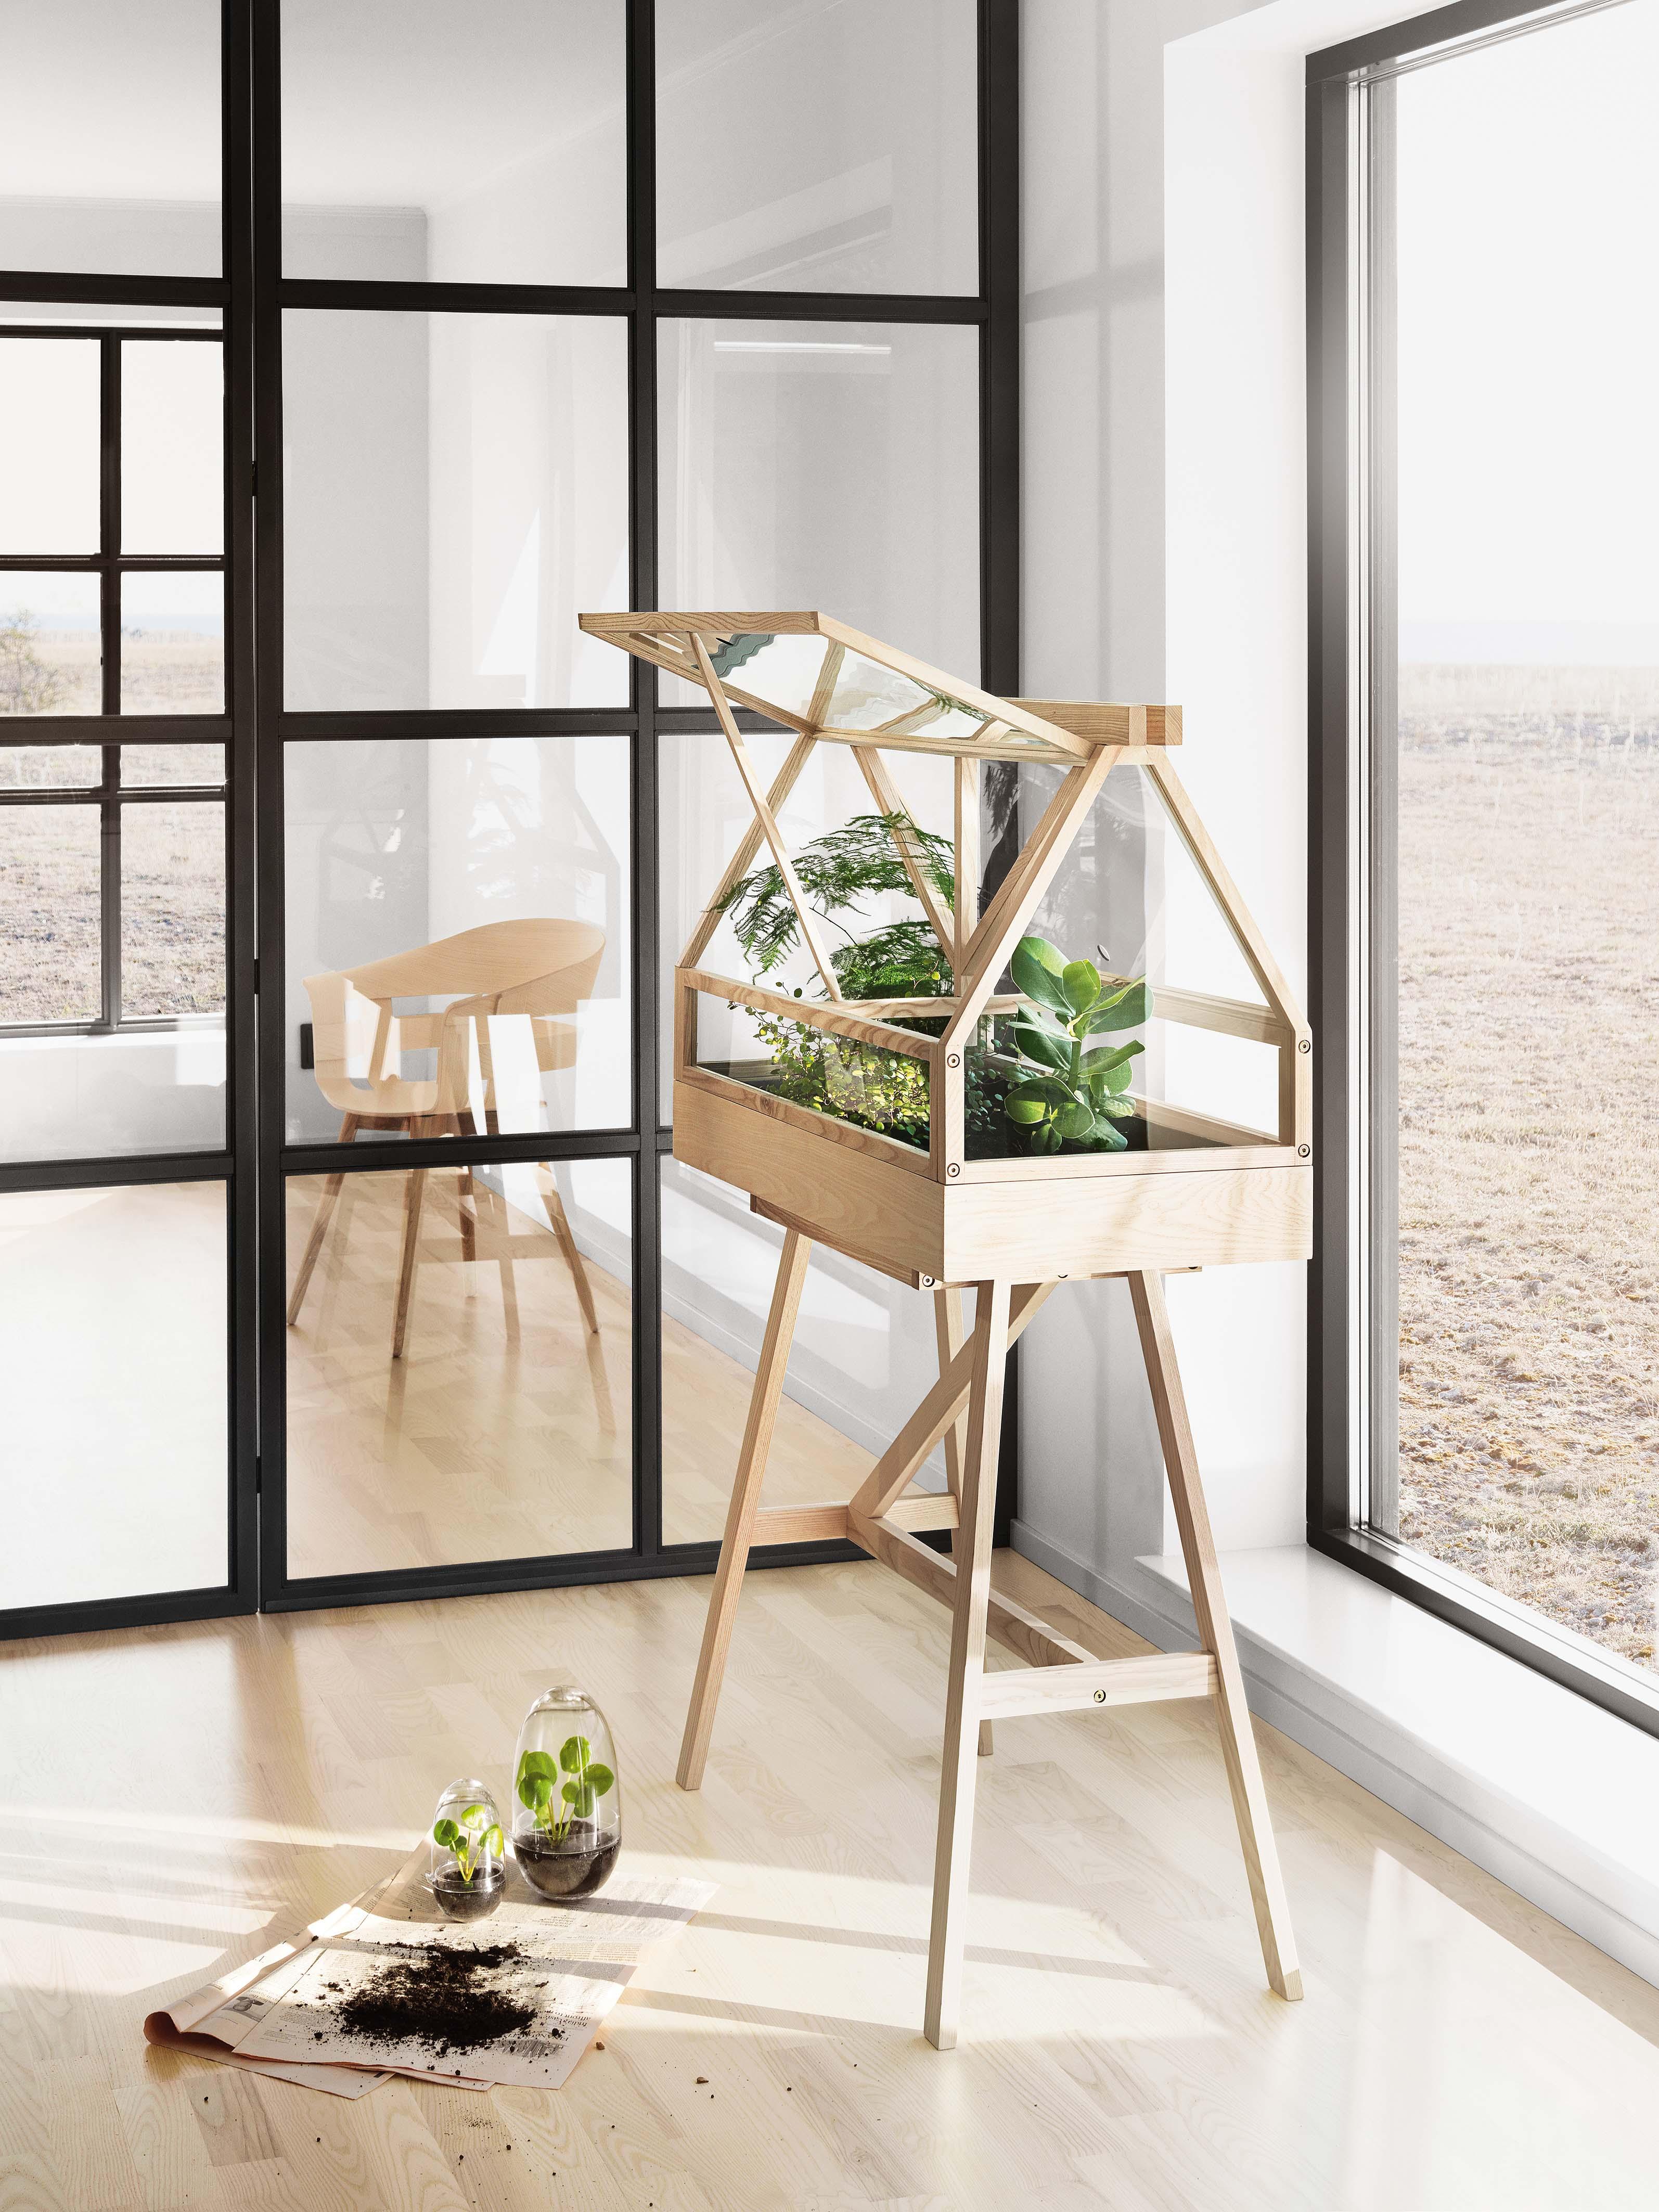 Greenhouse zimski vrt 459 kn, Modus